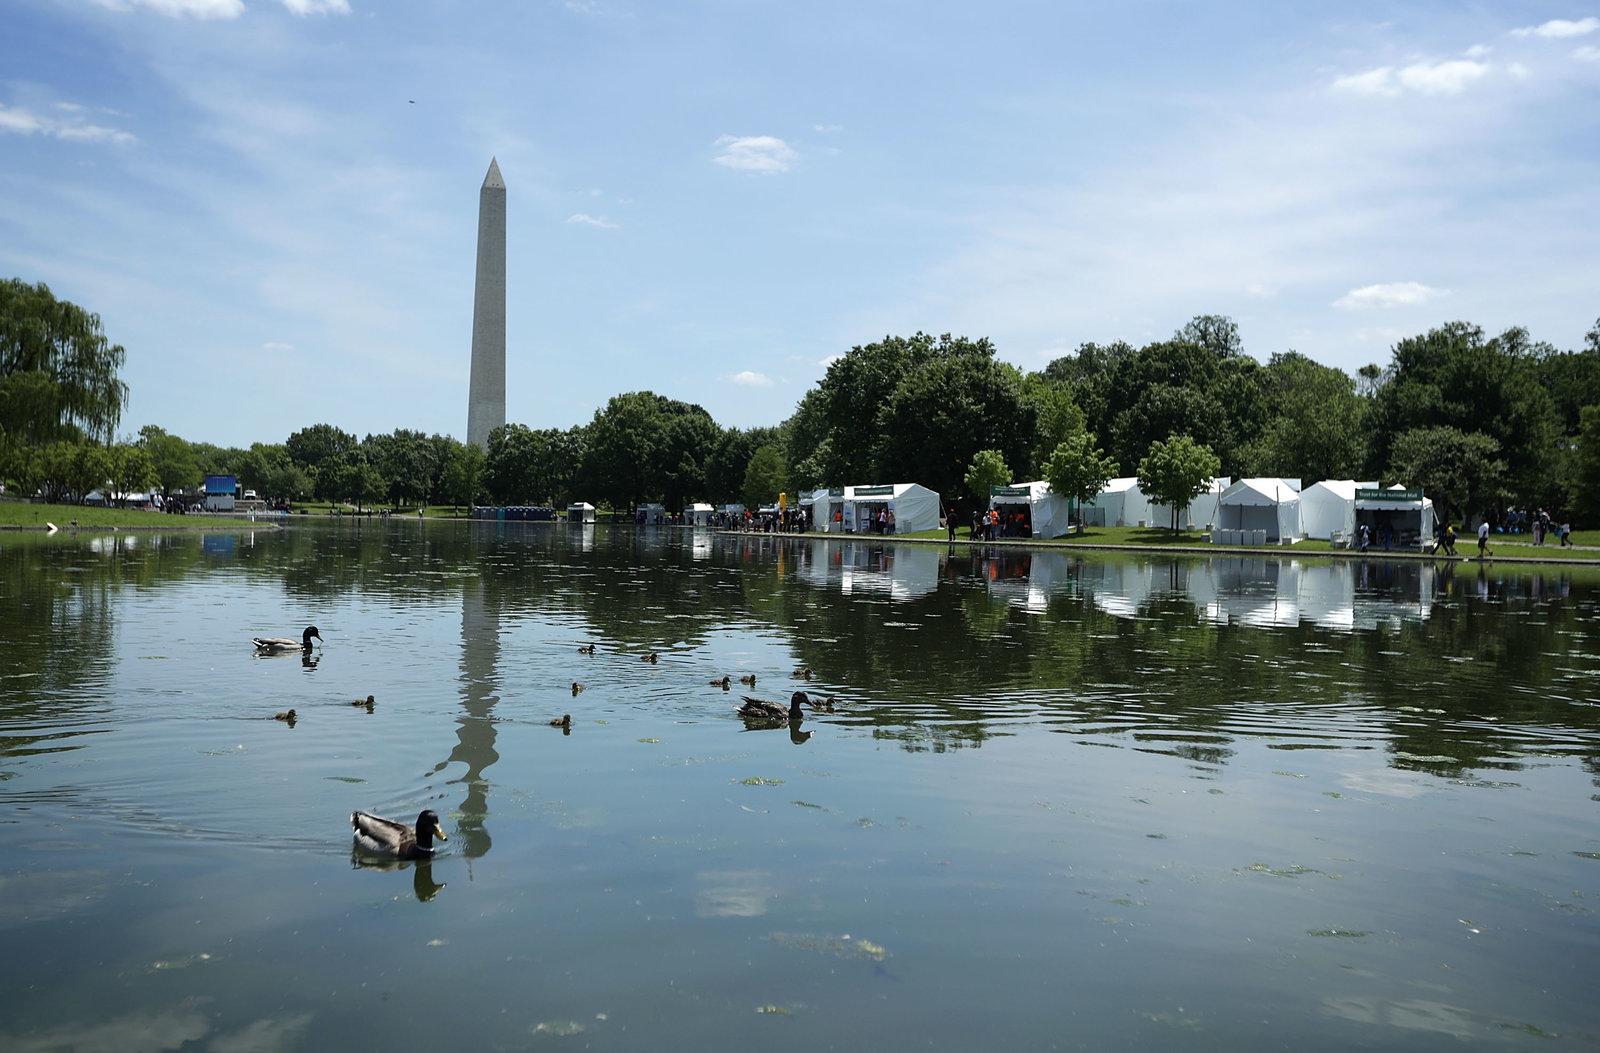 Washington D.C. made a major divestment announcement on Monday